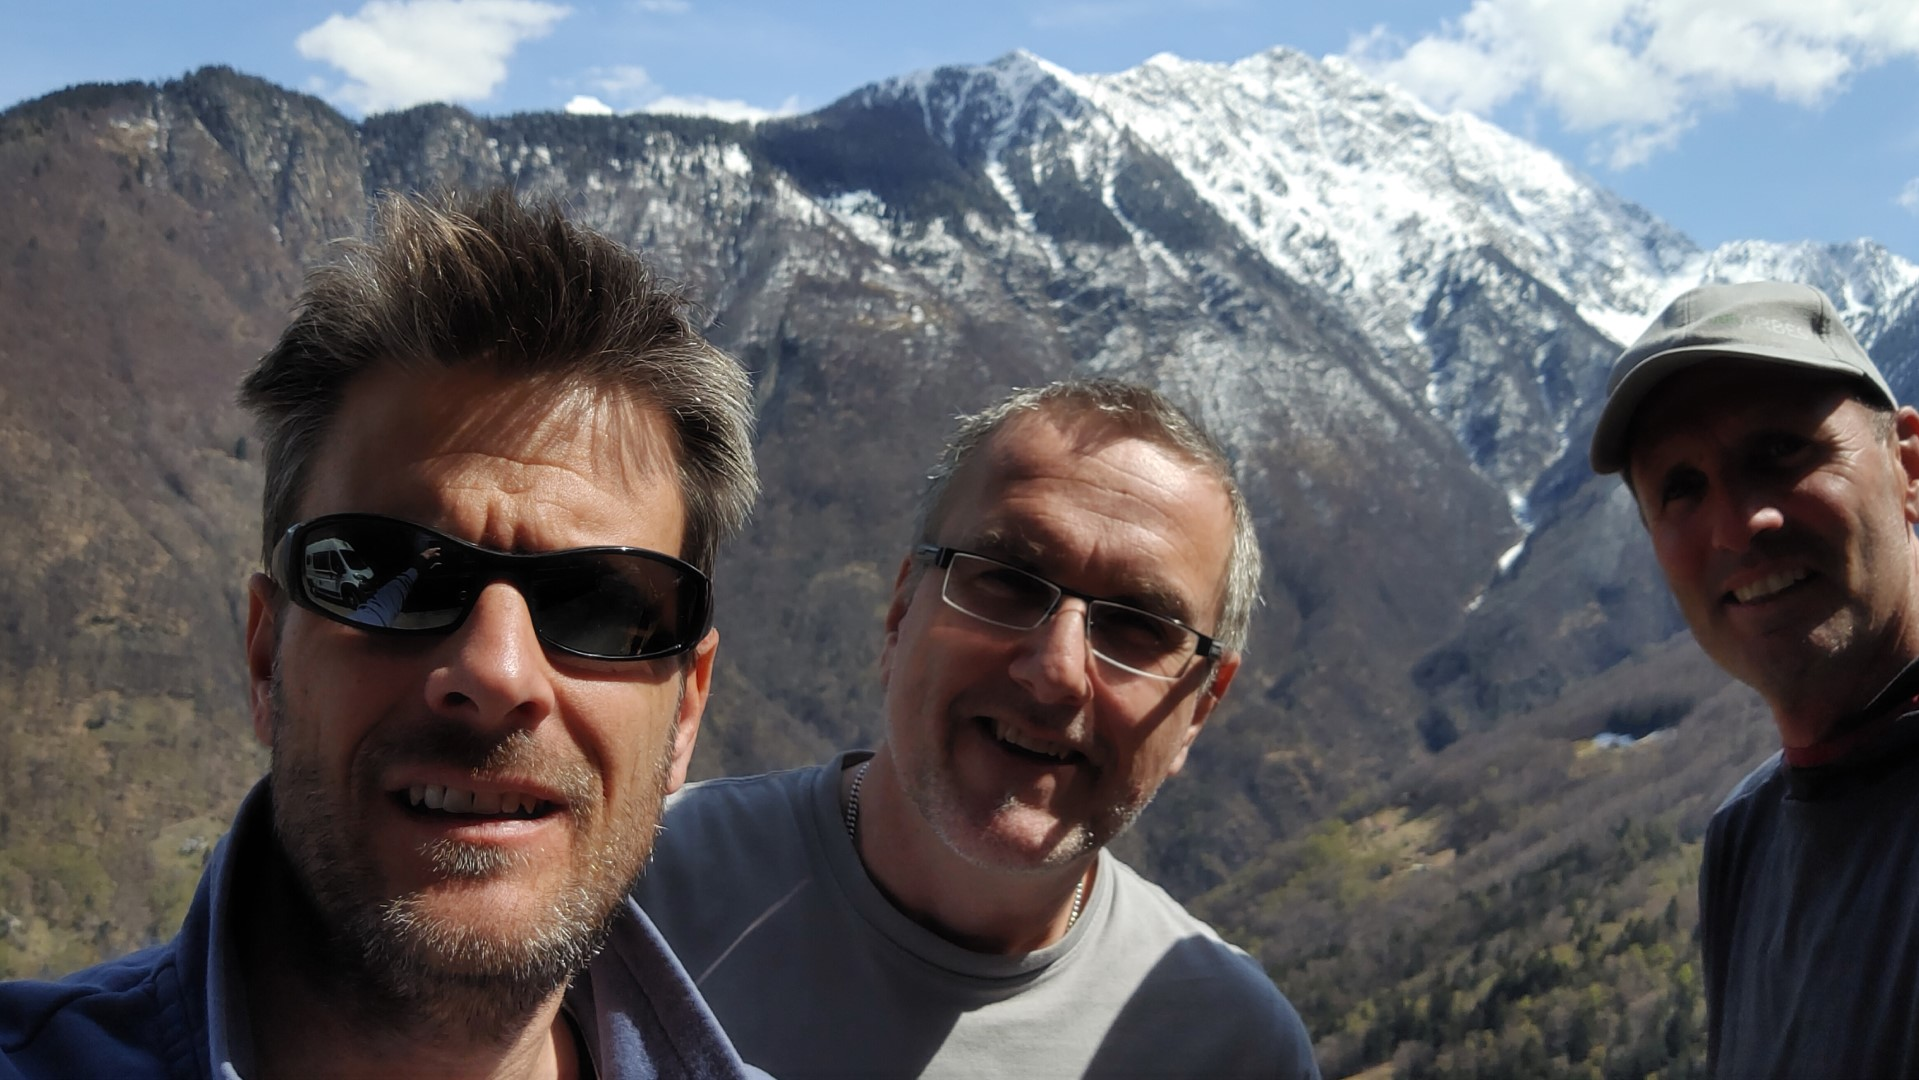 #247 Jens & Thomas Tour - Eierkampf und hallo Laura!